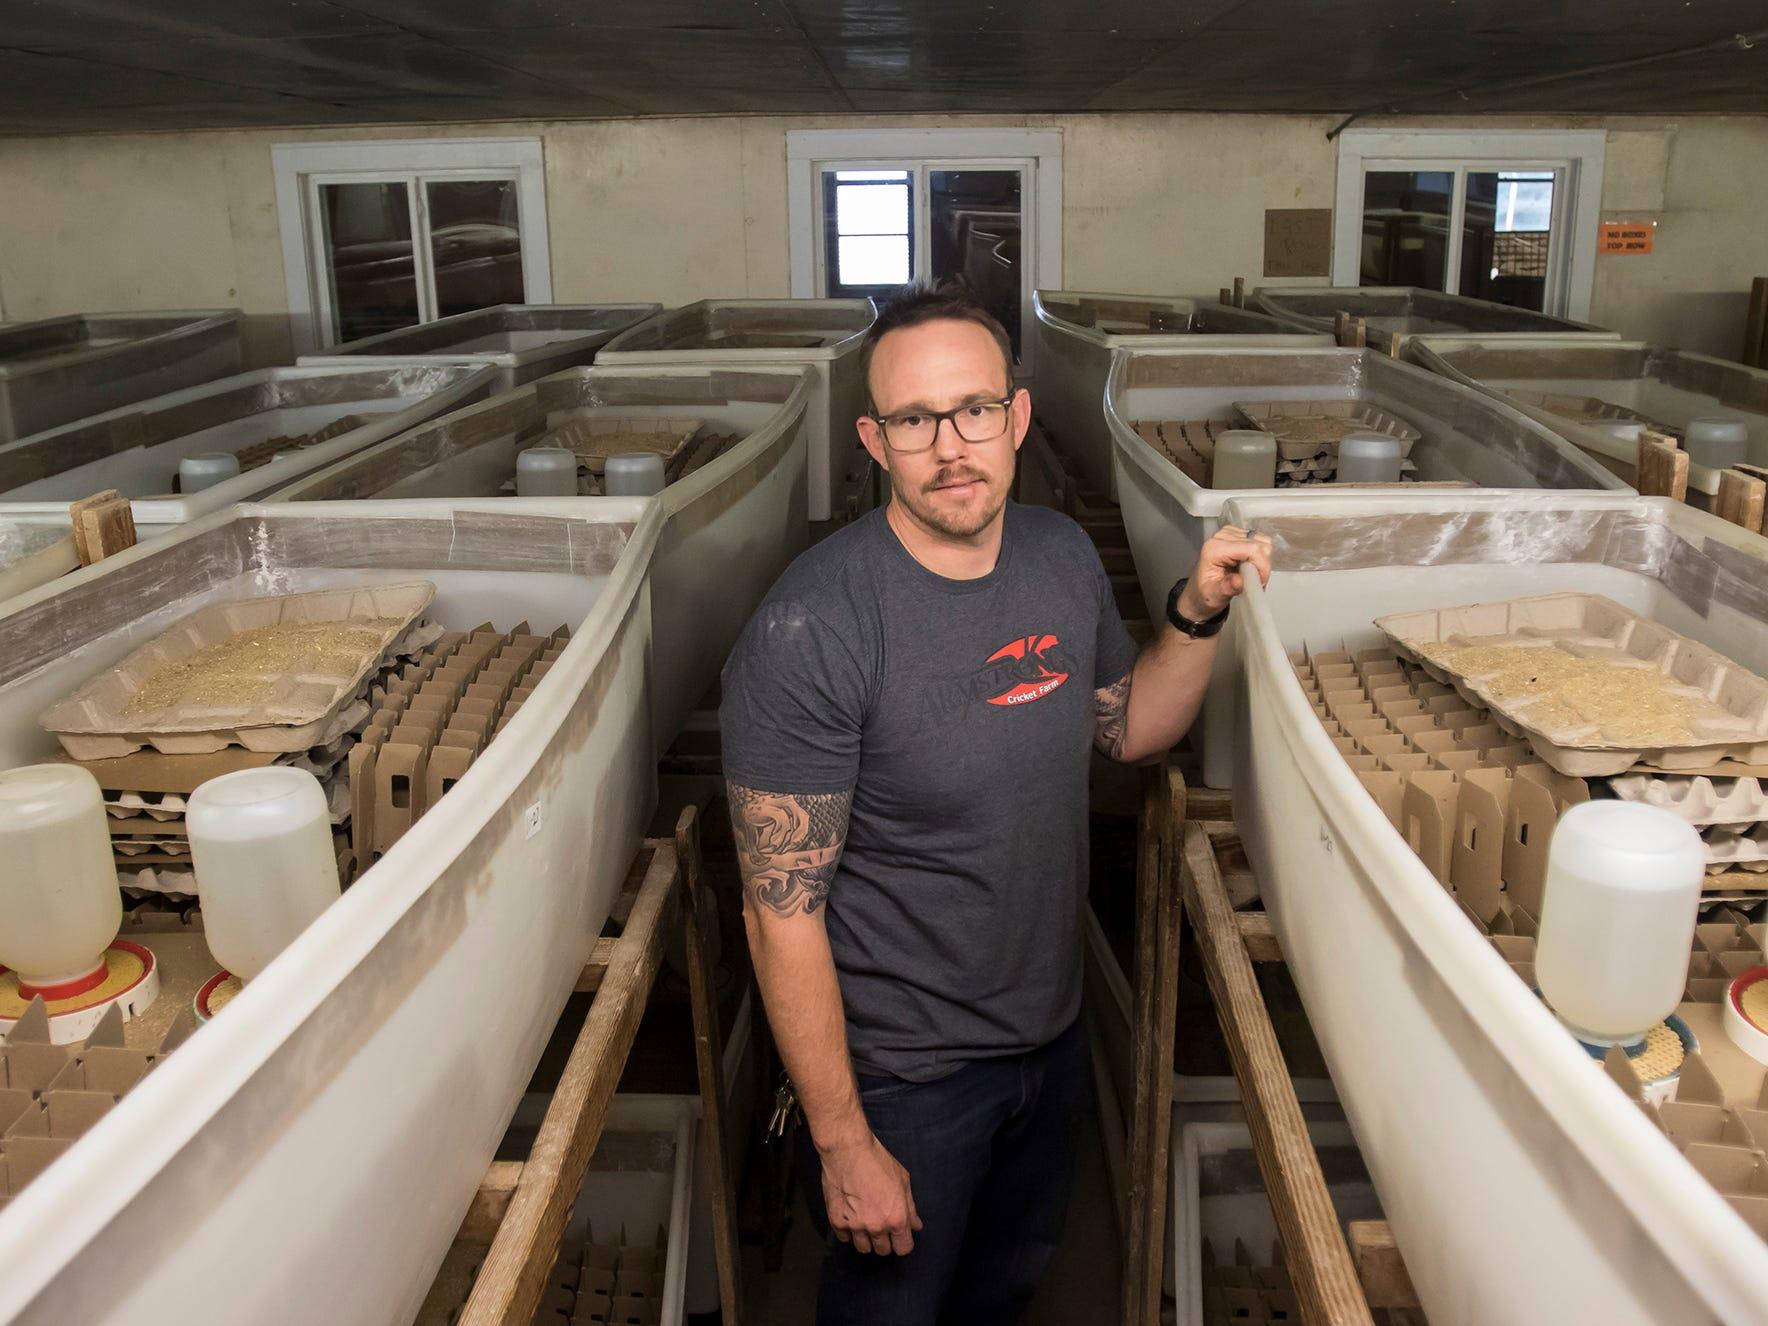 Crunchy: Louisiana farm hopes to expand into edible insect market